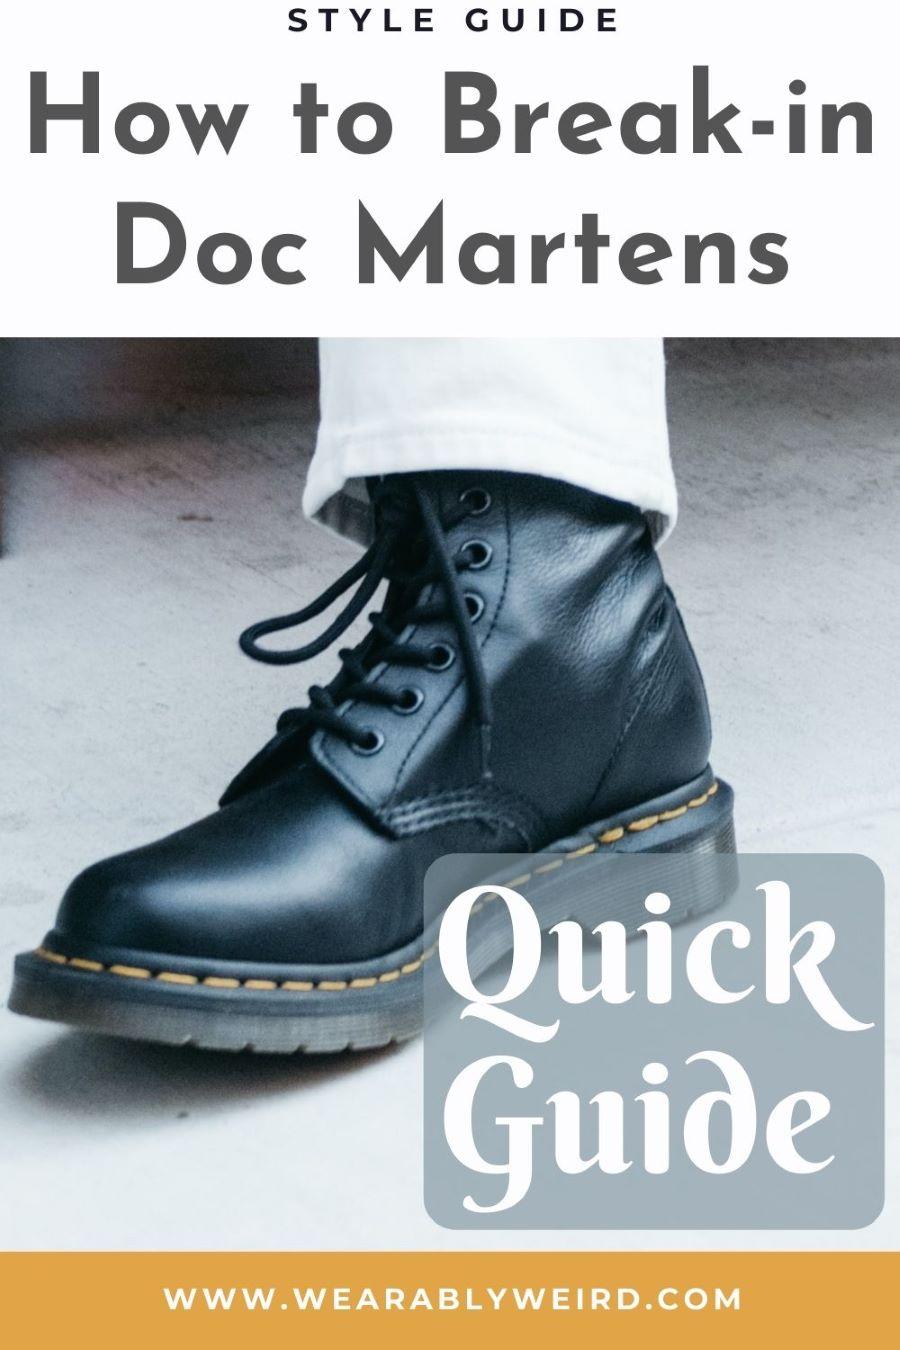 How to break in doc martens fast